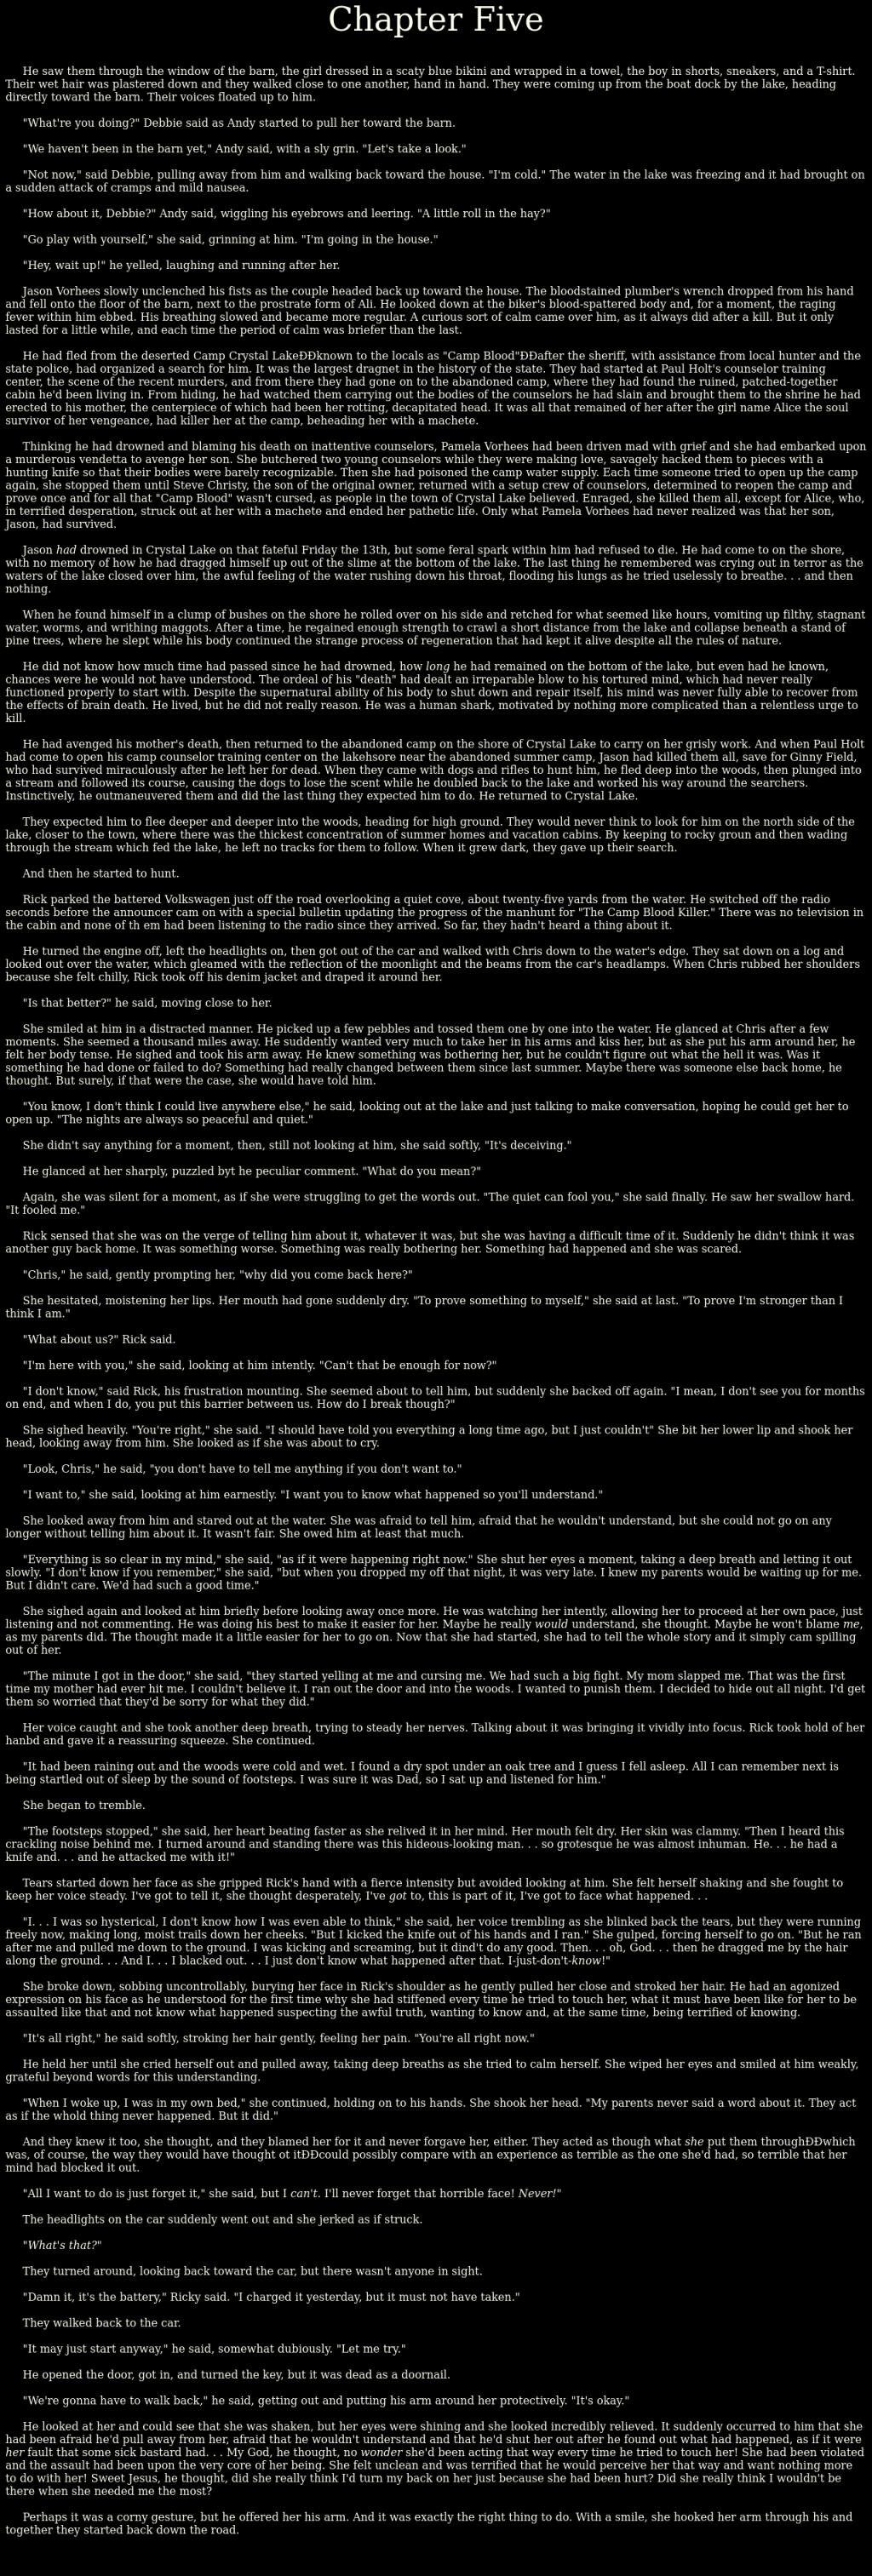 slashermania_tripod_com_html_book_f13p3_chap5_html